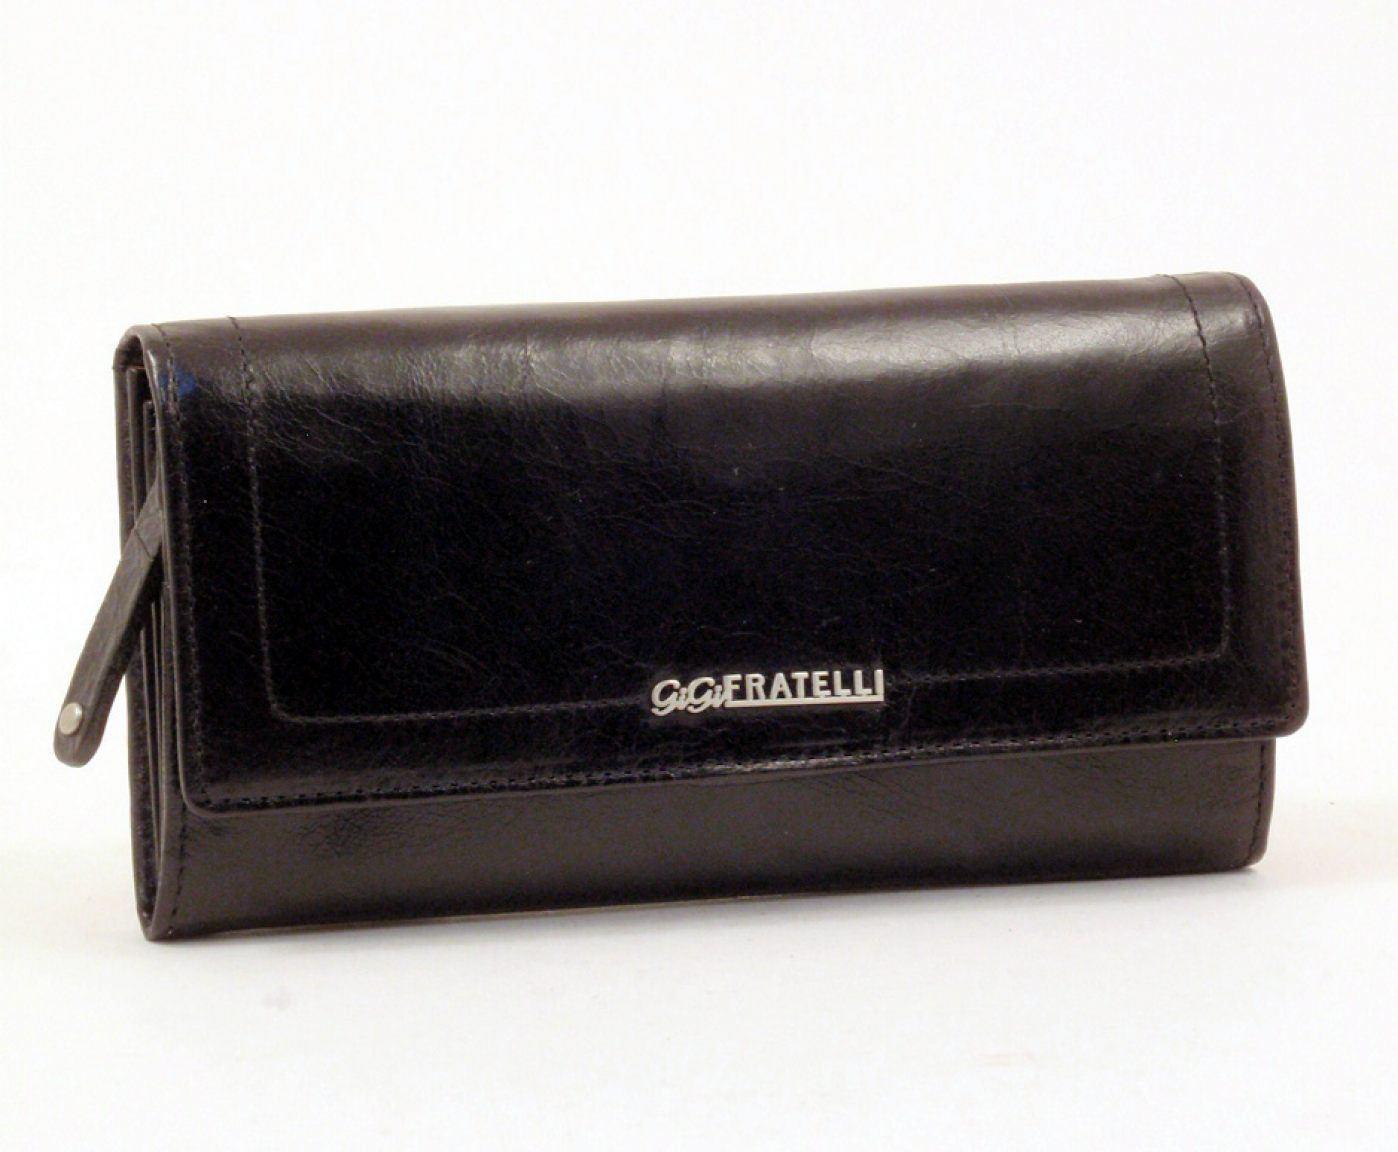 GiGi Fratelli Damengeldbörse Leder schwarz